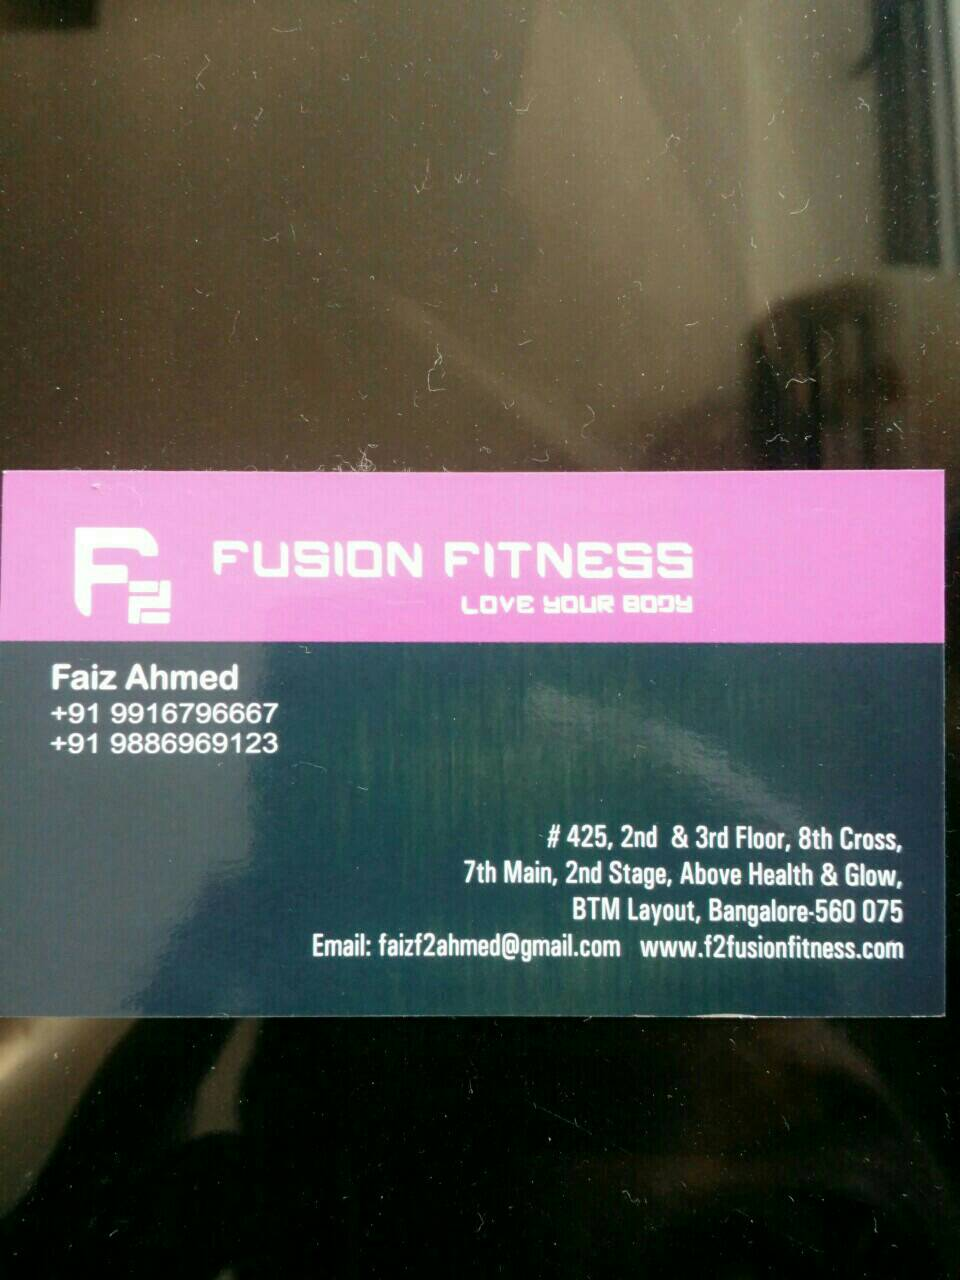 F2 Fusion Fitness